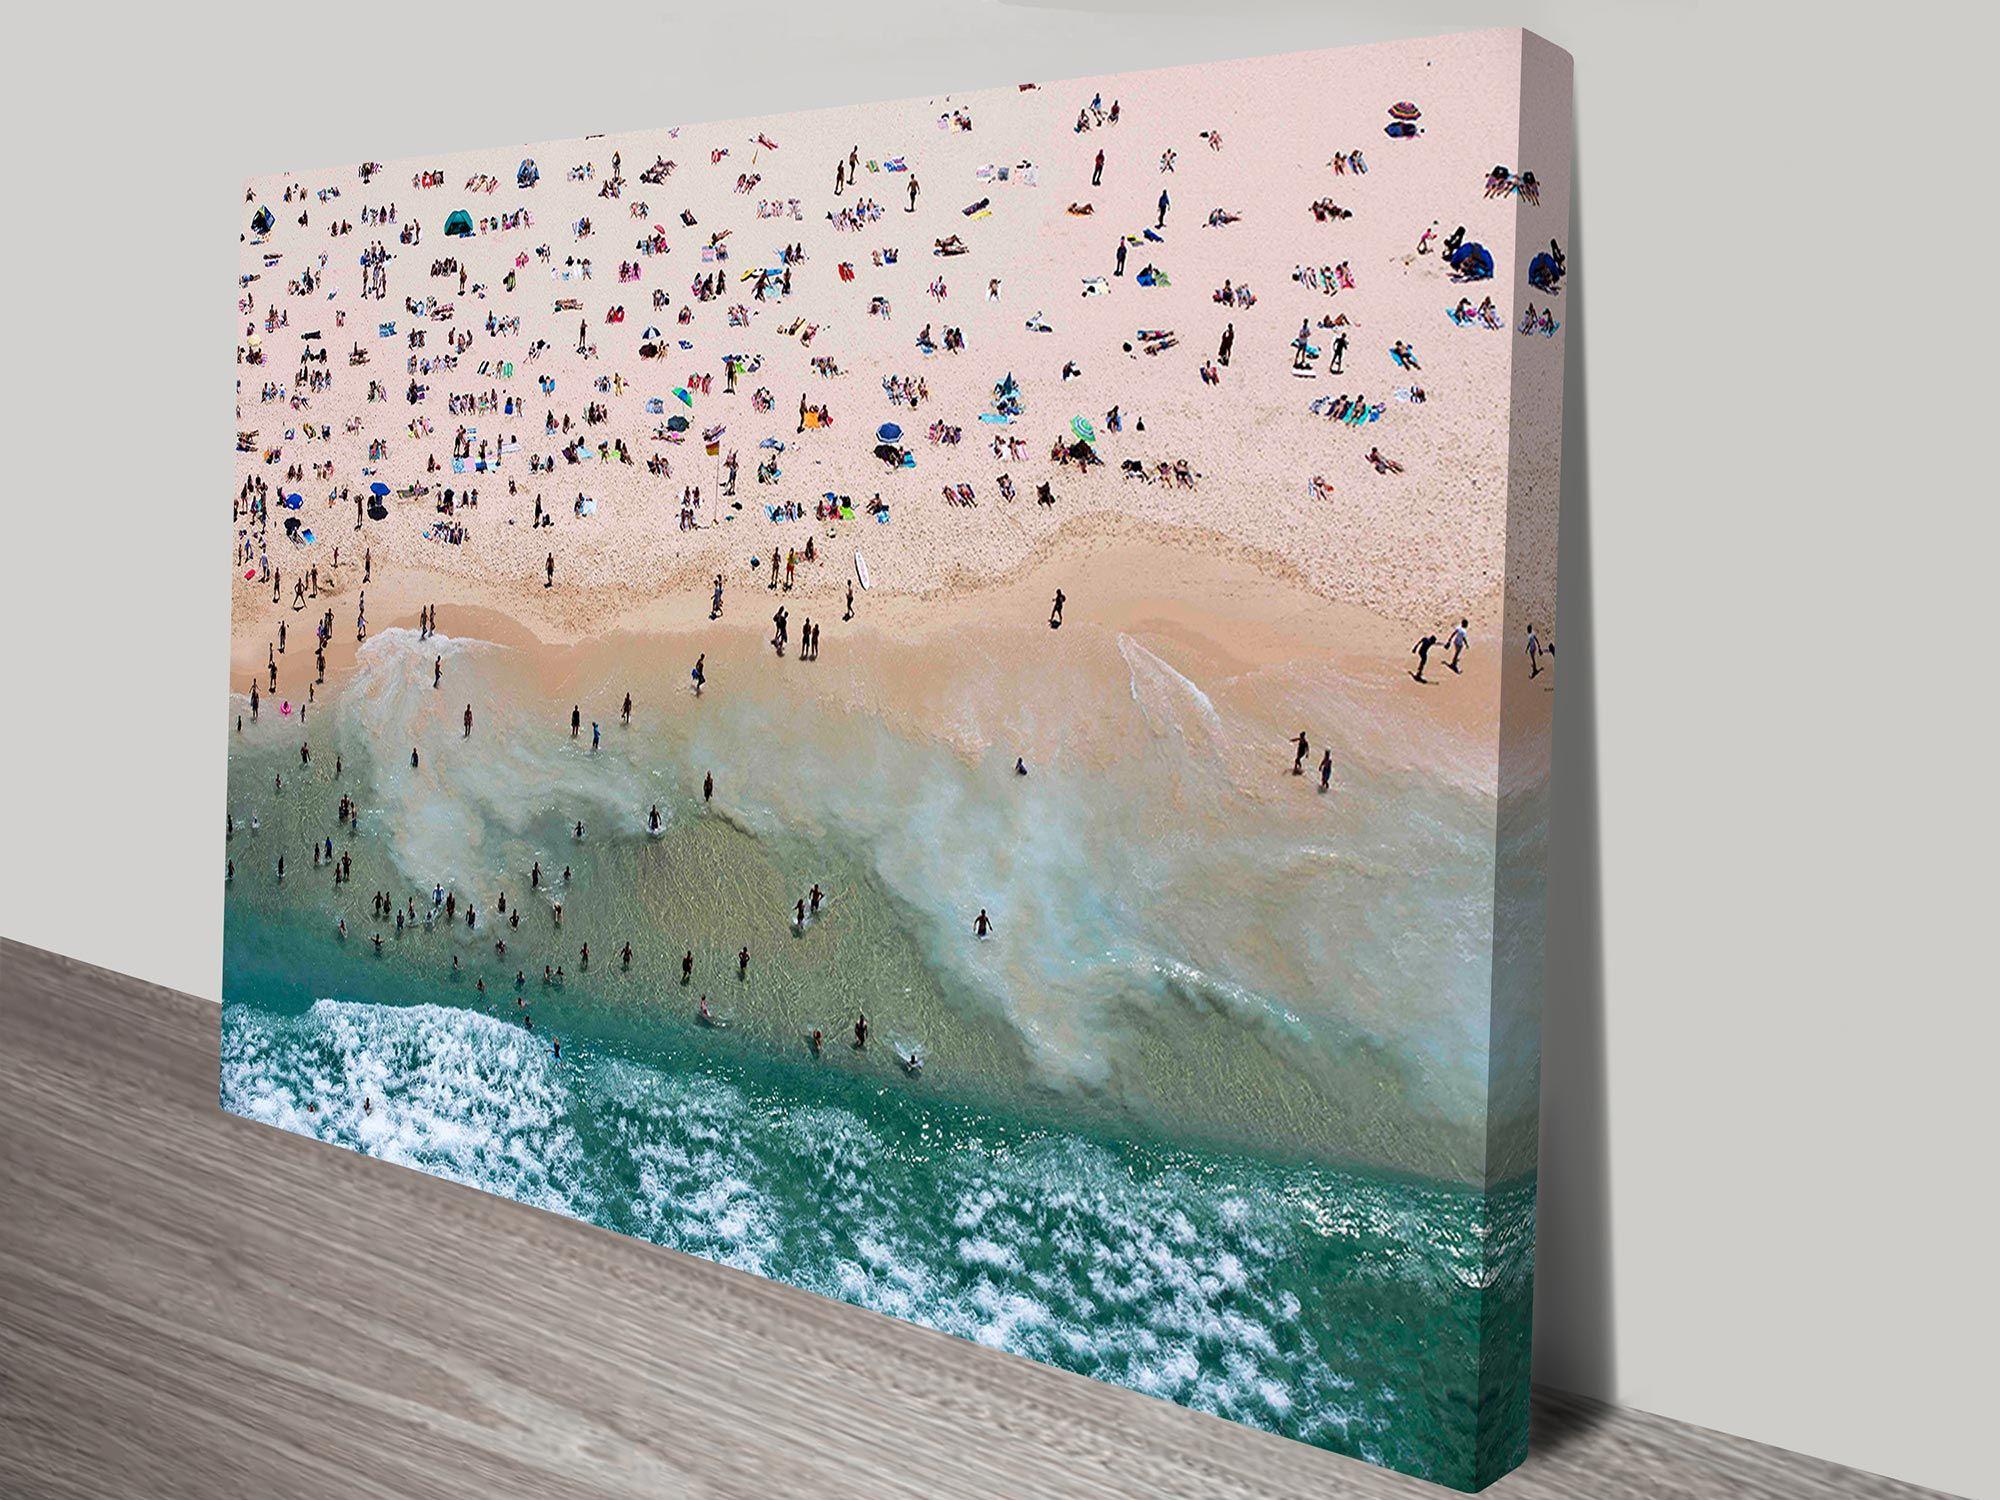 Bondi Beach Aerial Photo On Canvas Art Print Sydney Australia